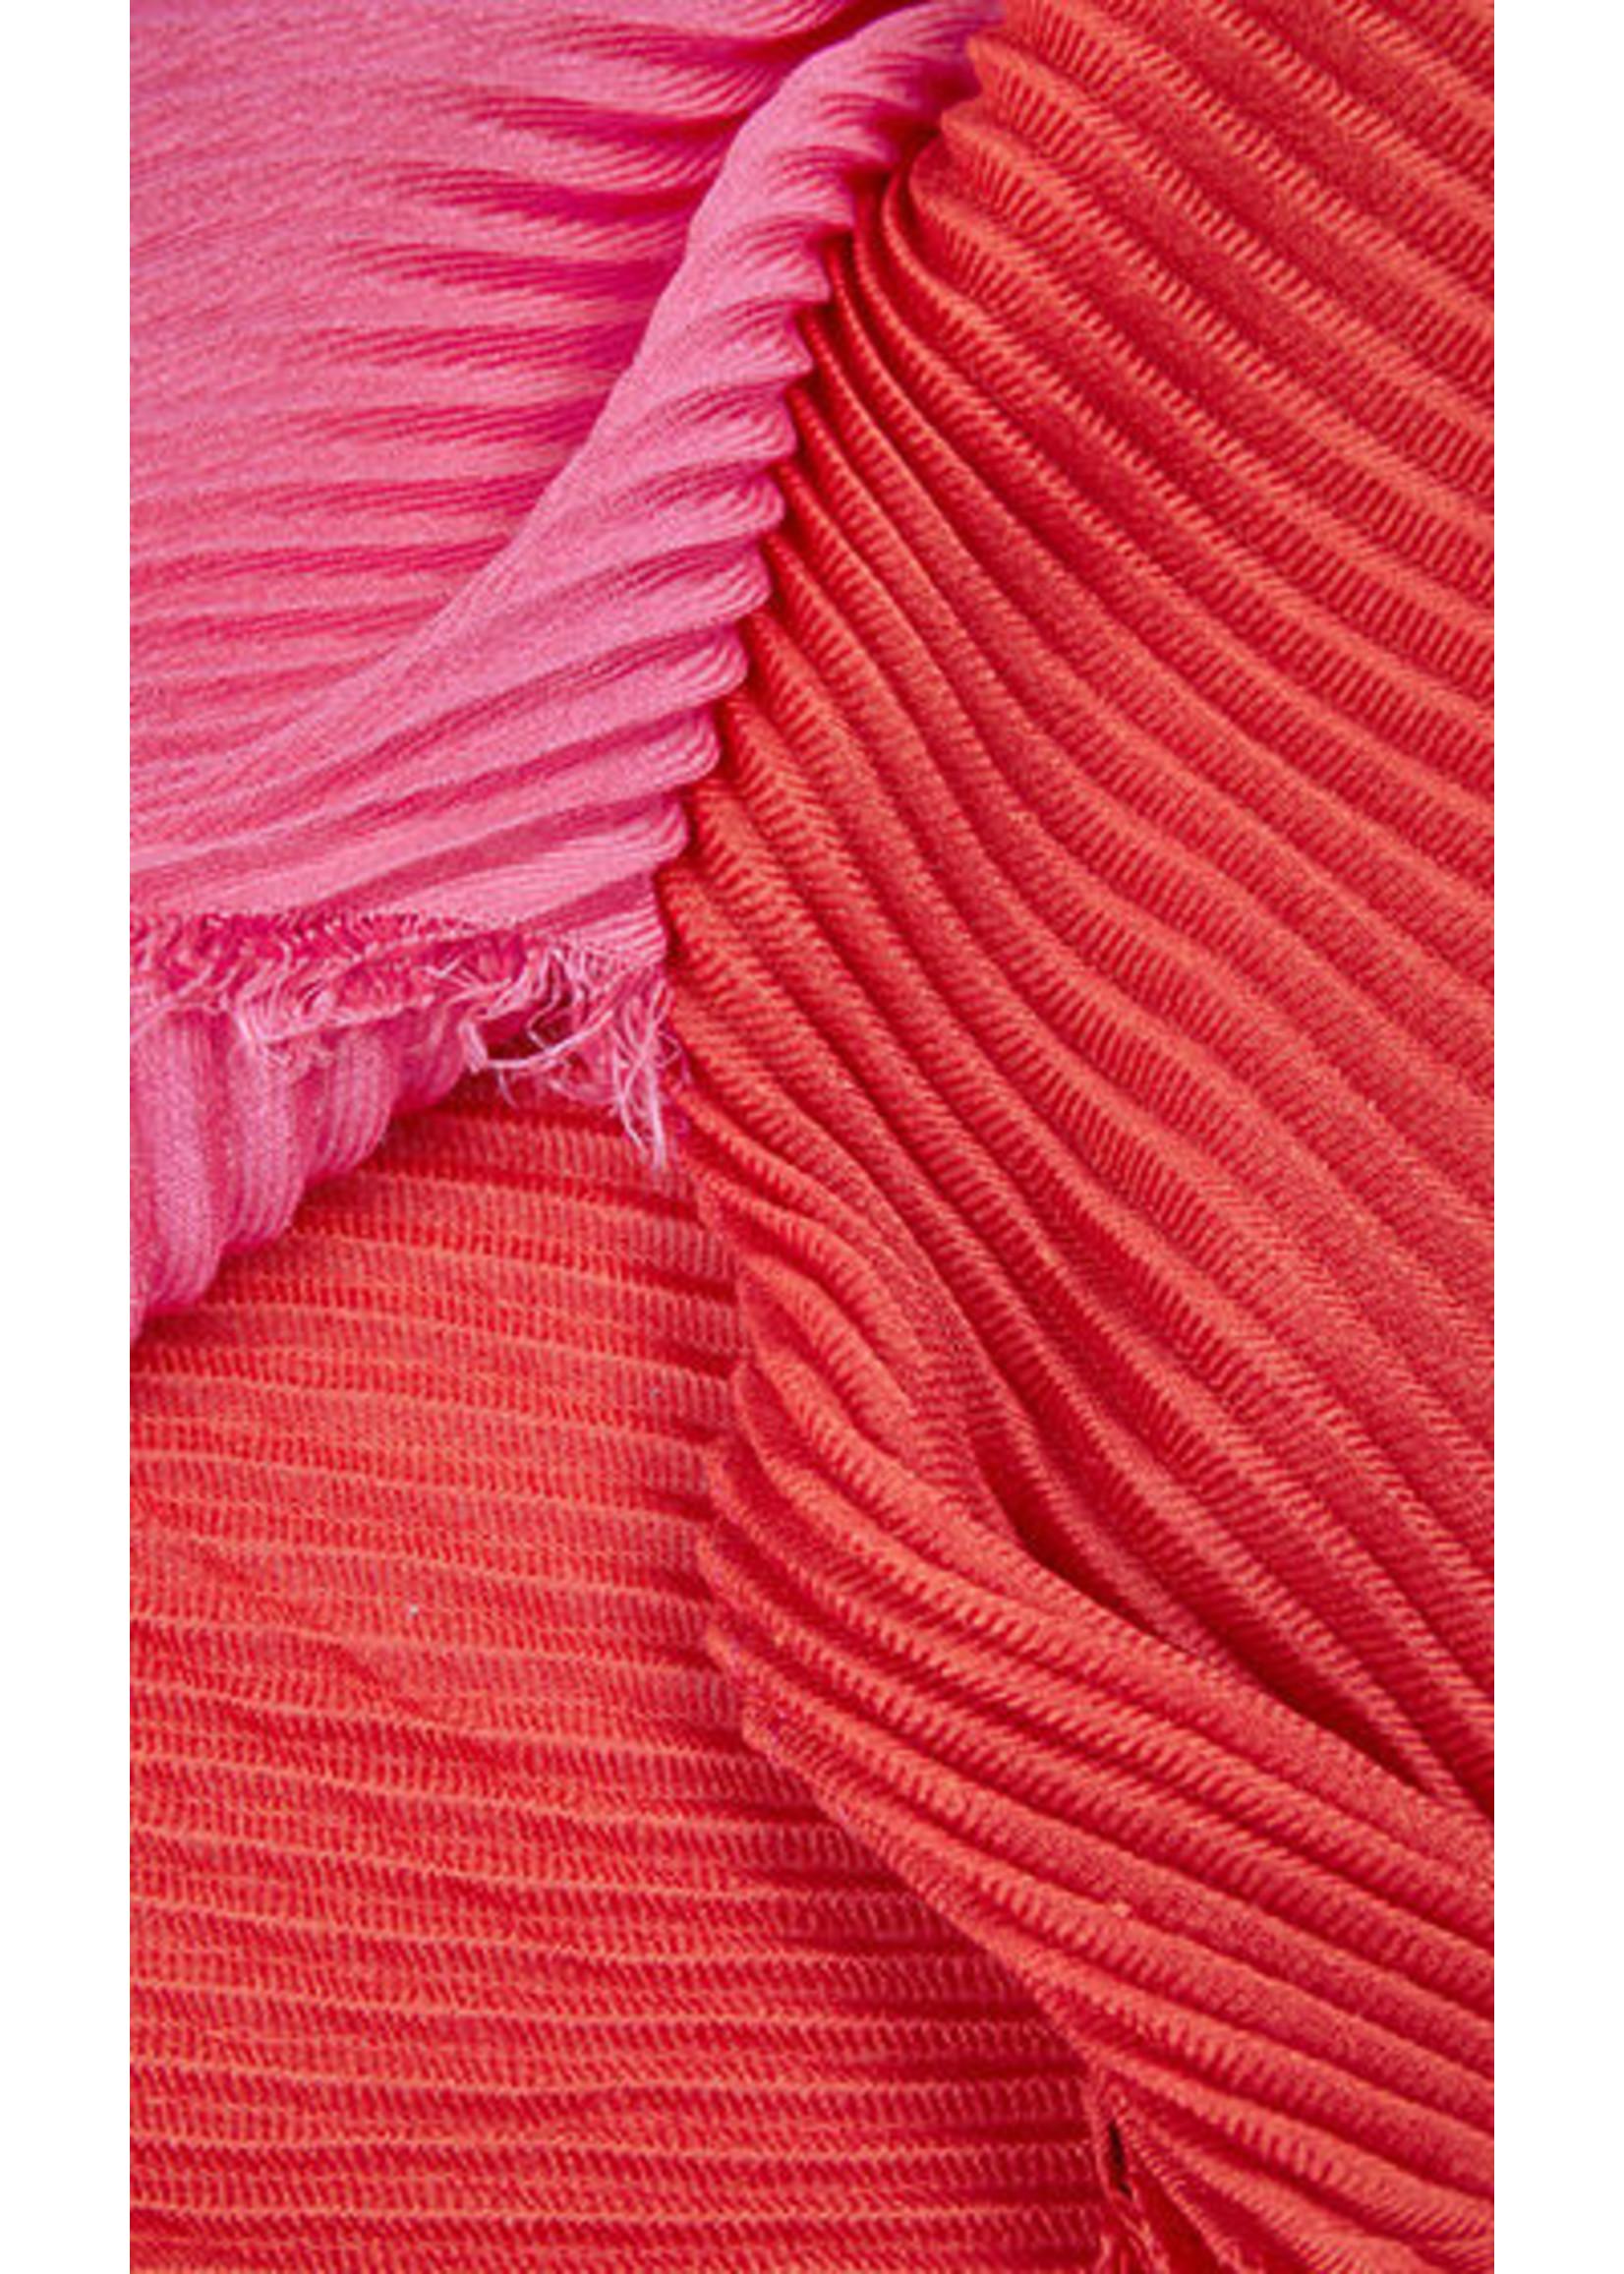 Sjaal RC B4.04 Z71 super pink